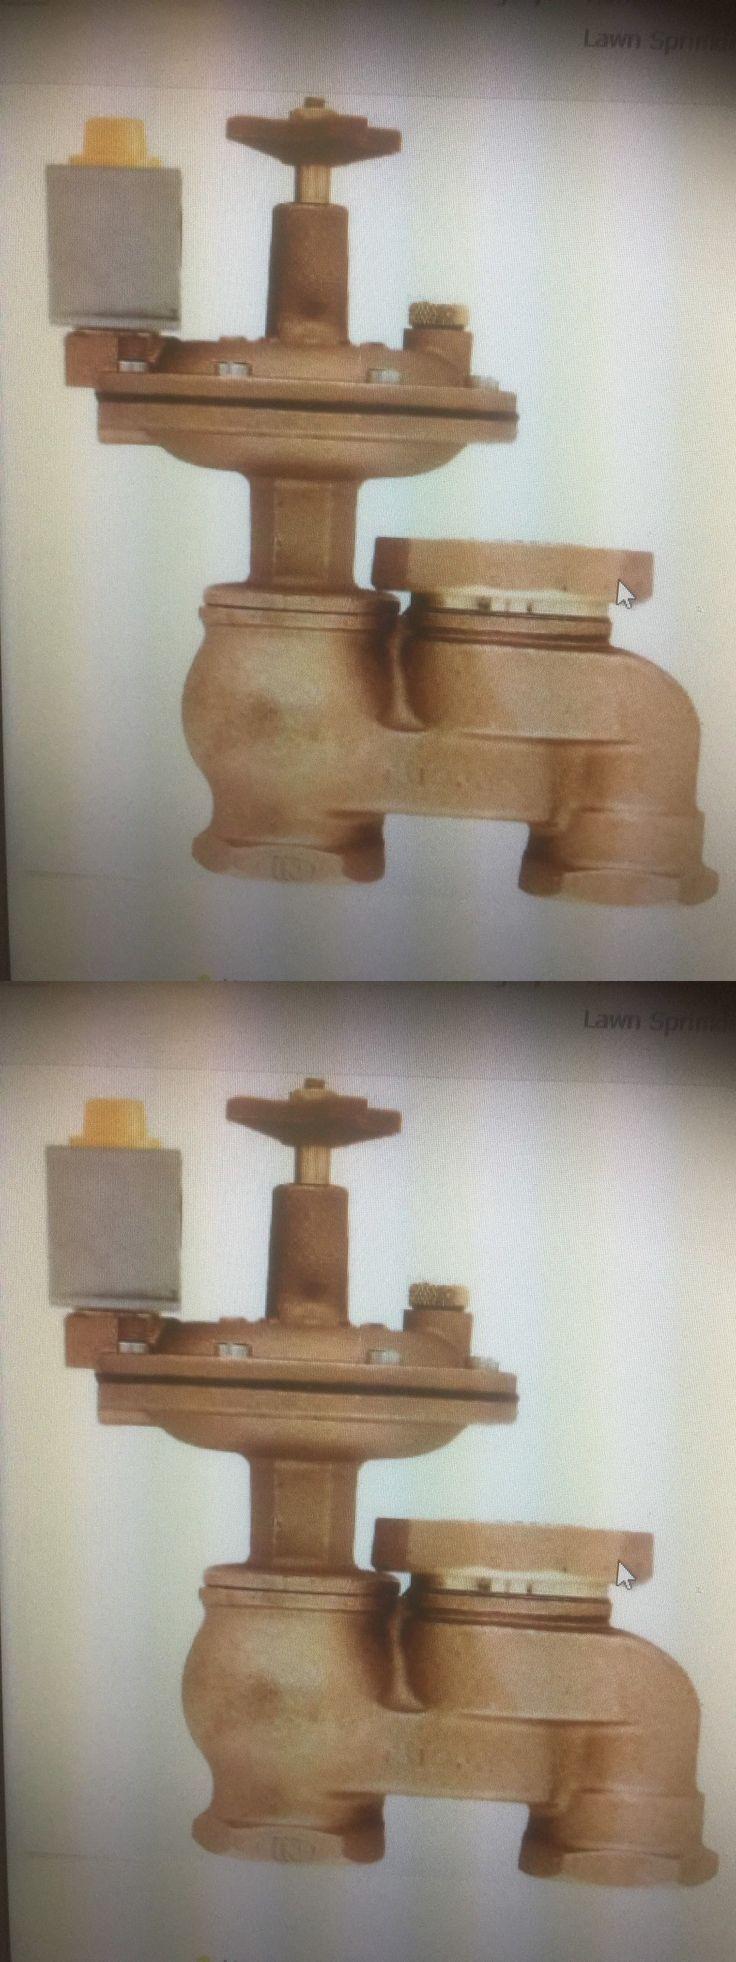 Valves 75673: Orbit Sprinkler System 3 4 Inch Auto Brass Anti Siphon Valve 57065 -> BUY IT NOW ONLY: $44.95 on eBay!